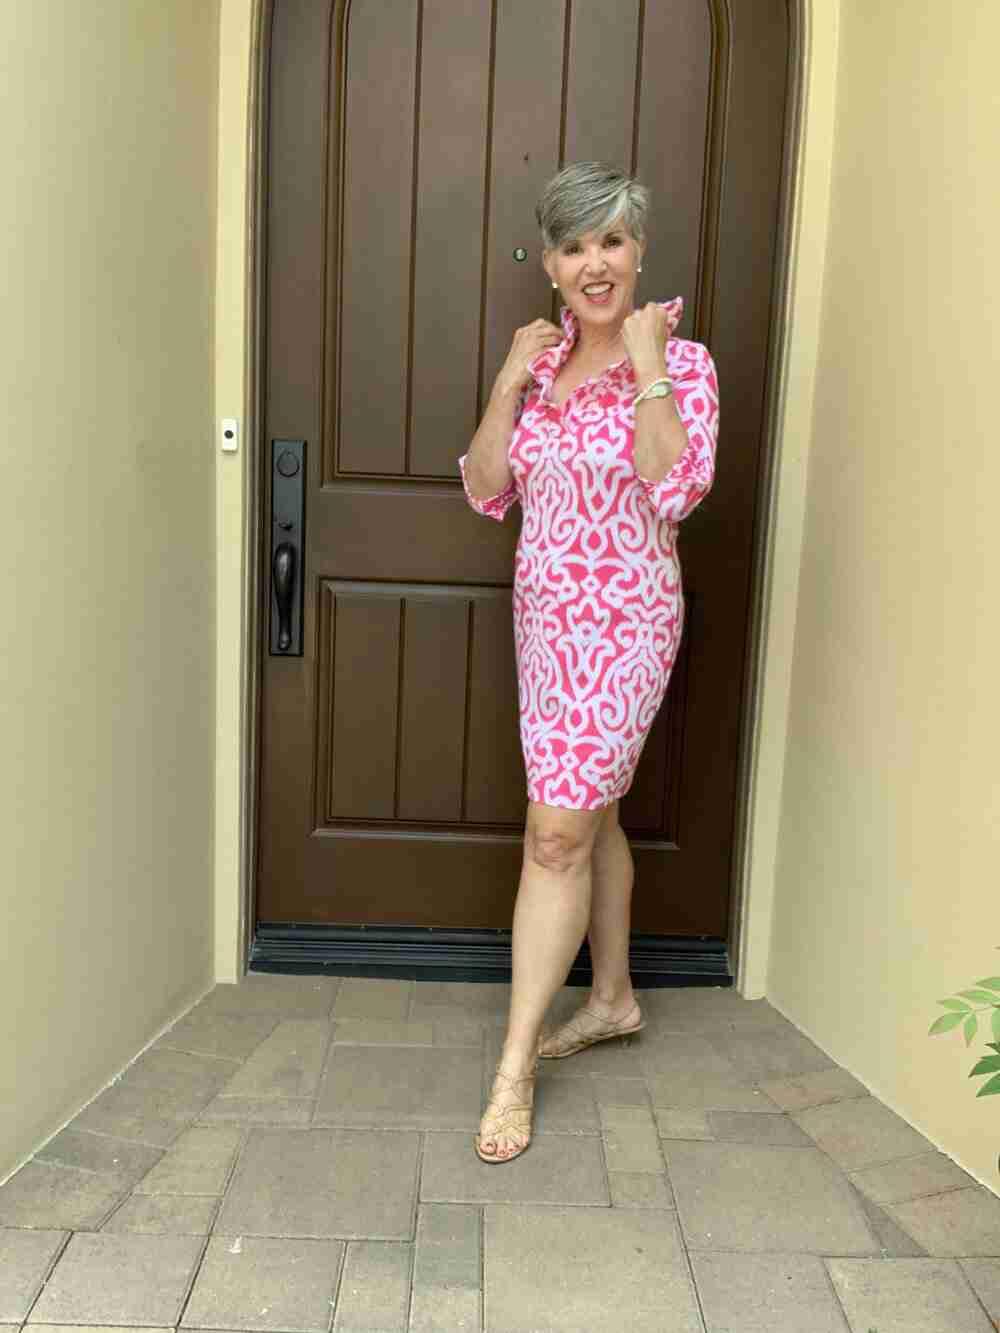 very fun style dress